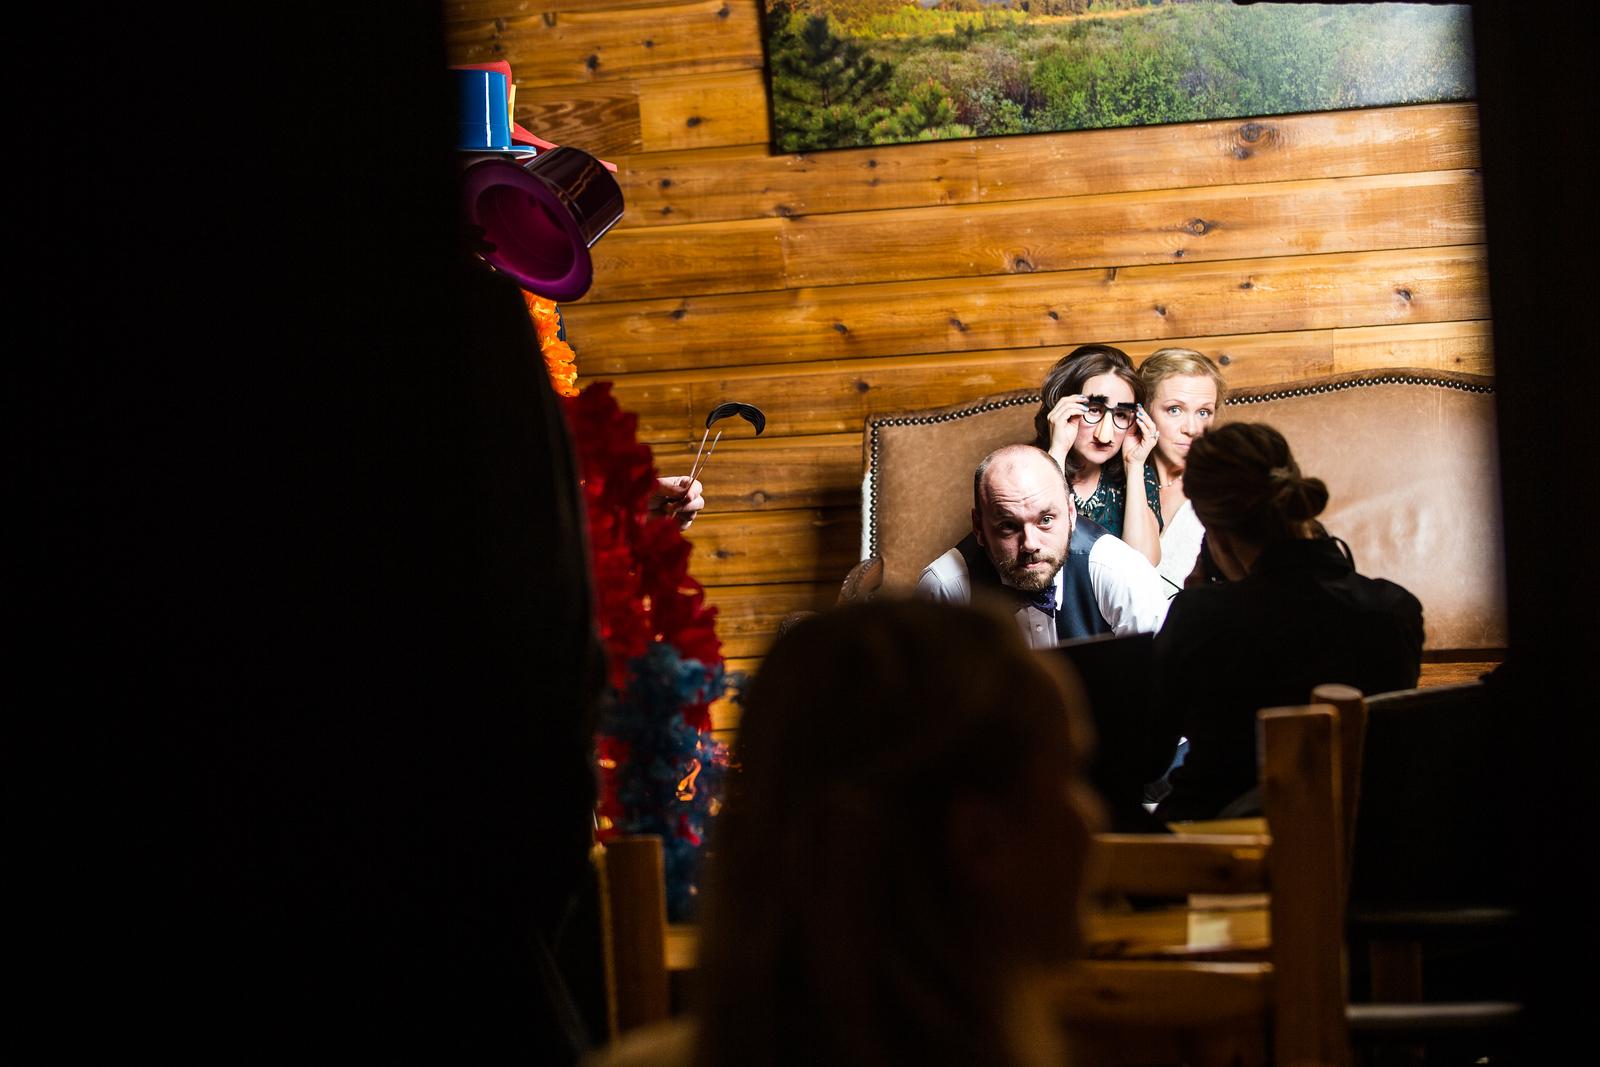 Sarah & Alex's Wedding at Wild Basin Lodge on 2/18/17